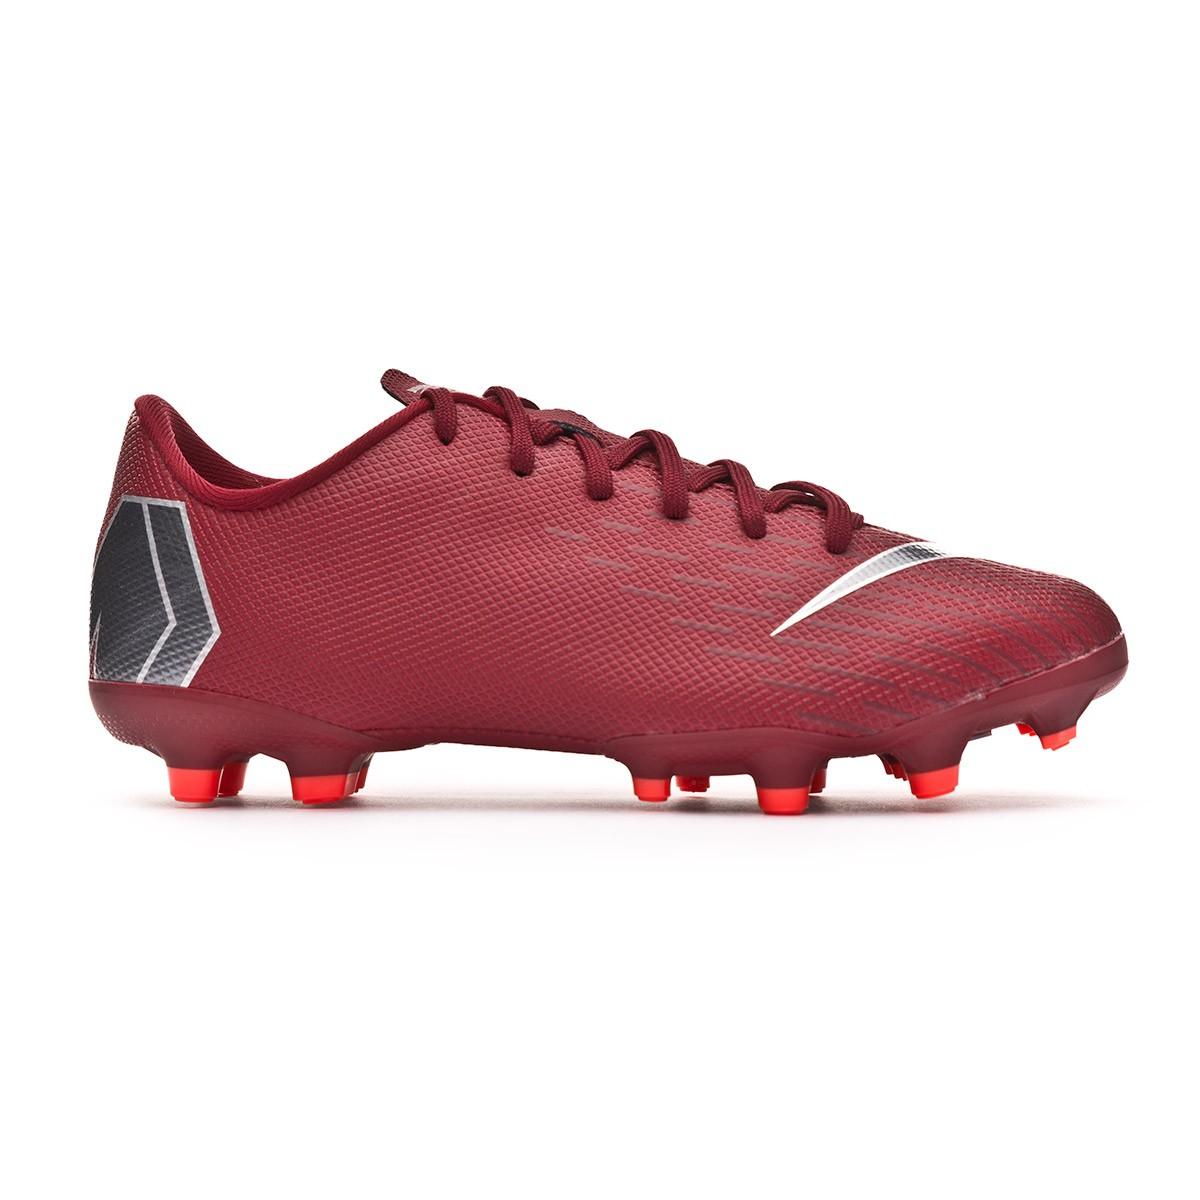 pretty nice 65f60 ce9ae Chaussure de foot Nike Mercurial Vapor XII Academy GS MG enfant Team  red-Metallic dark grey-Bright crimson - Boutique de football Fútbol Emotion